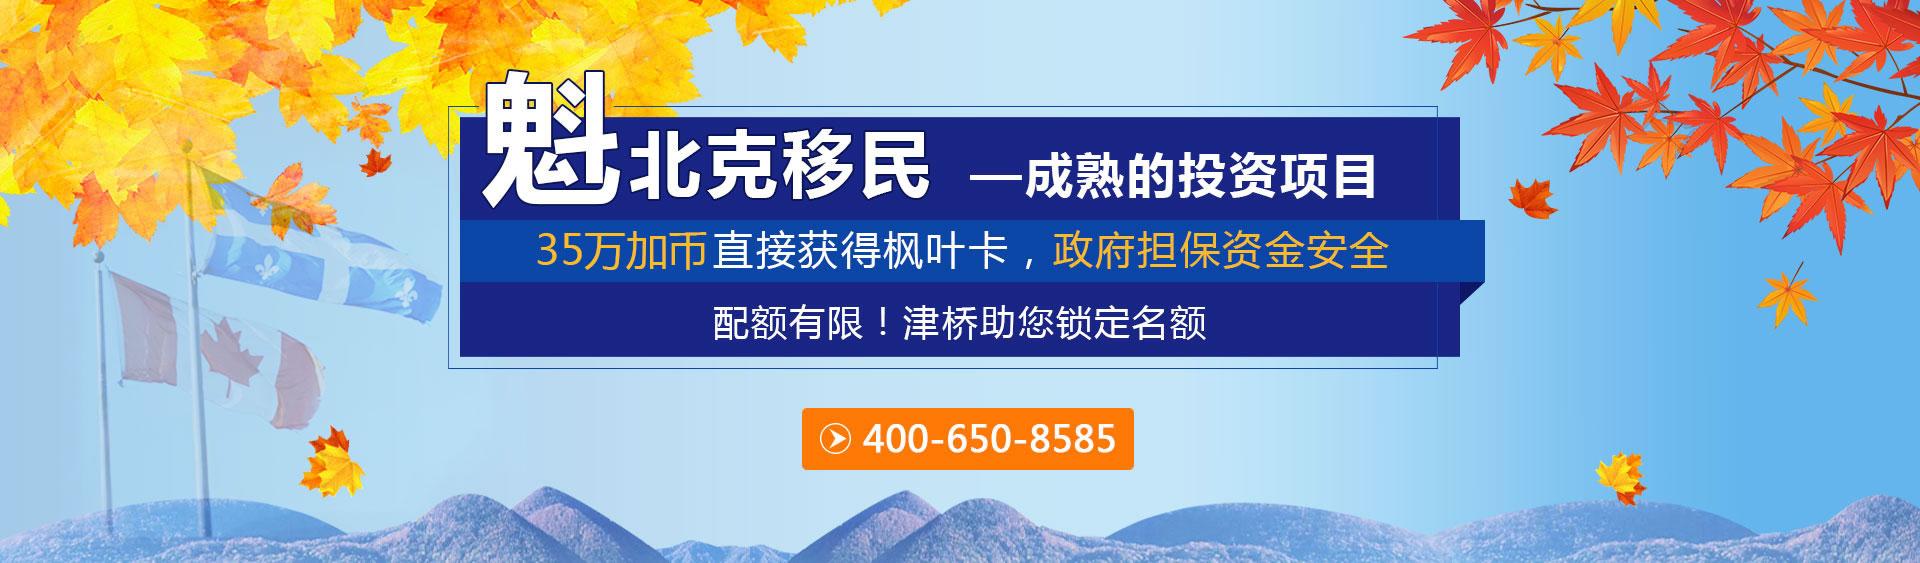 魁省投资移民banner